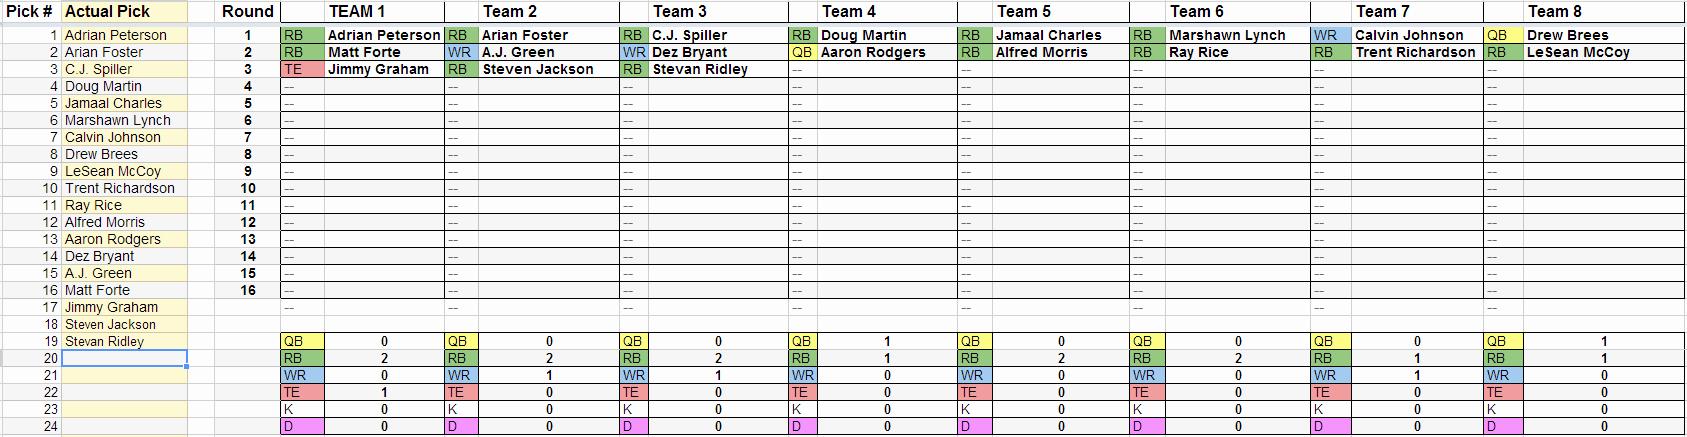 Fantasy Football Roster Sheet Blank Best Of Microsoft Excel Fantasy Football Template Full Version